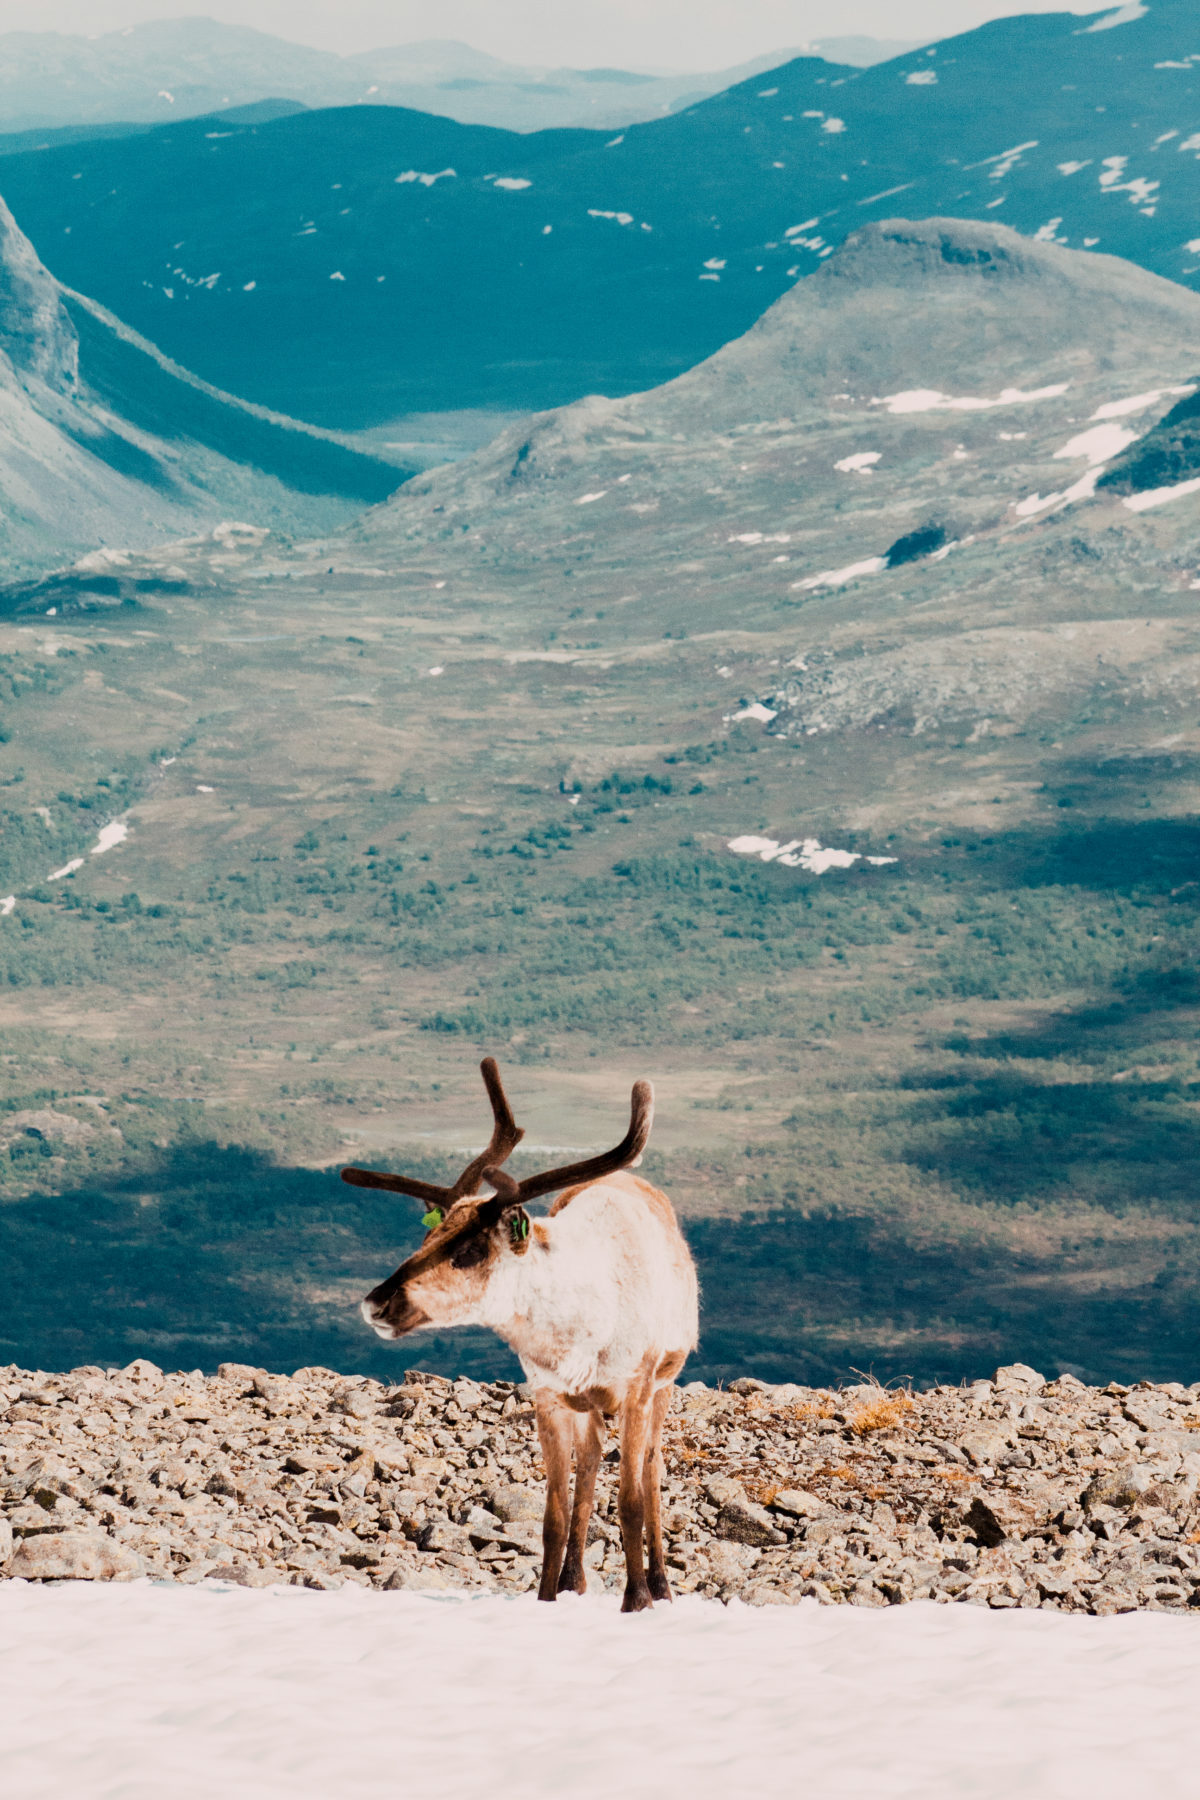 Reindeer at Besseggen.